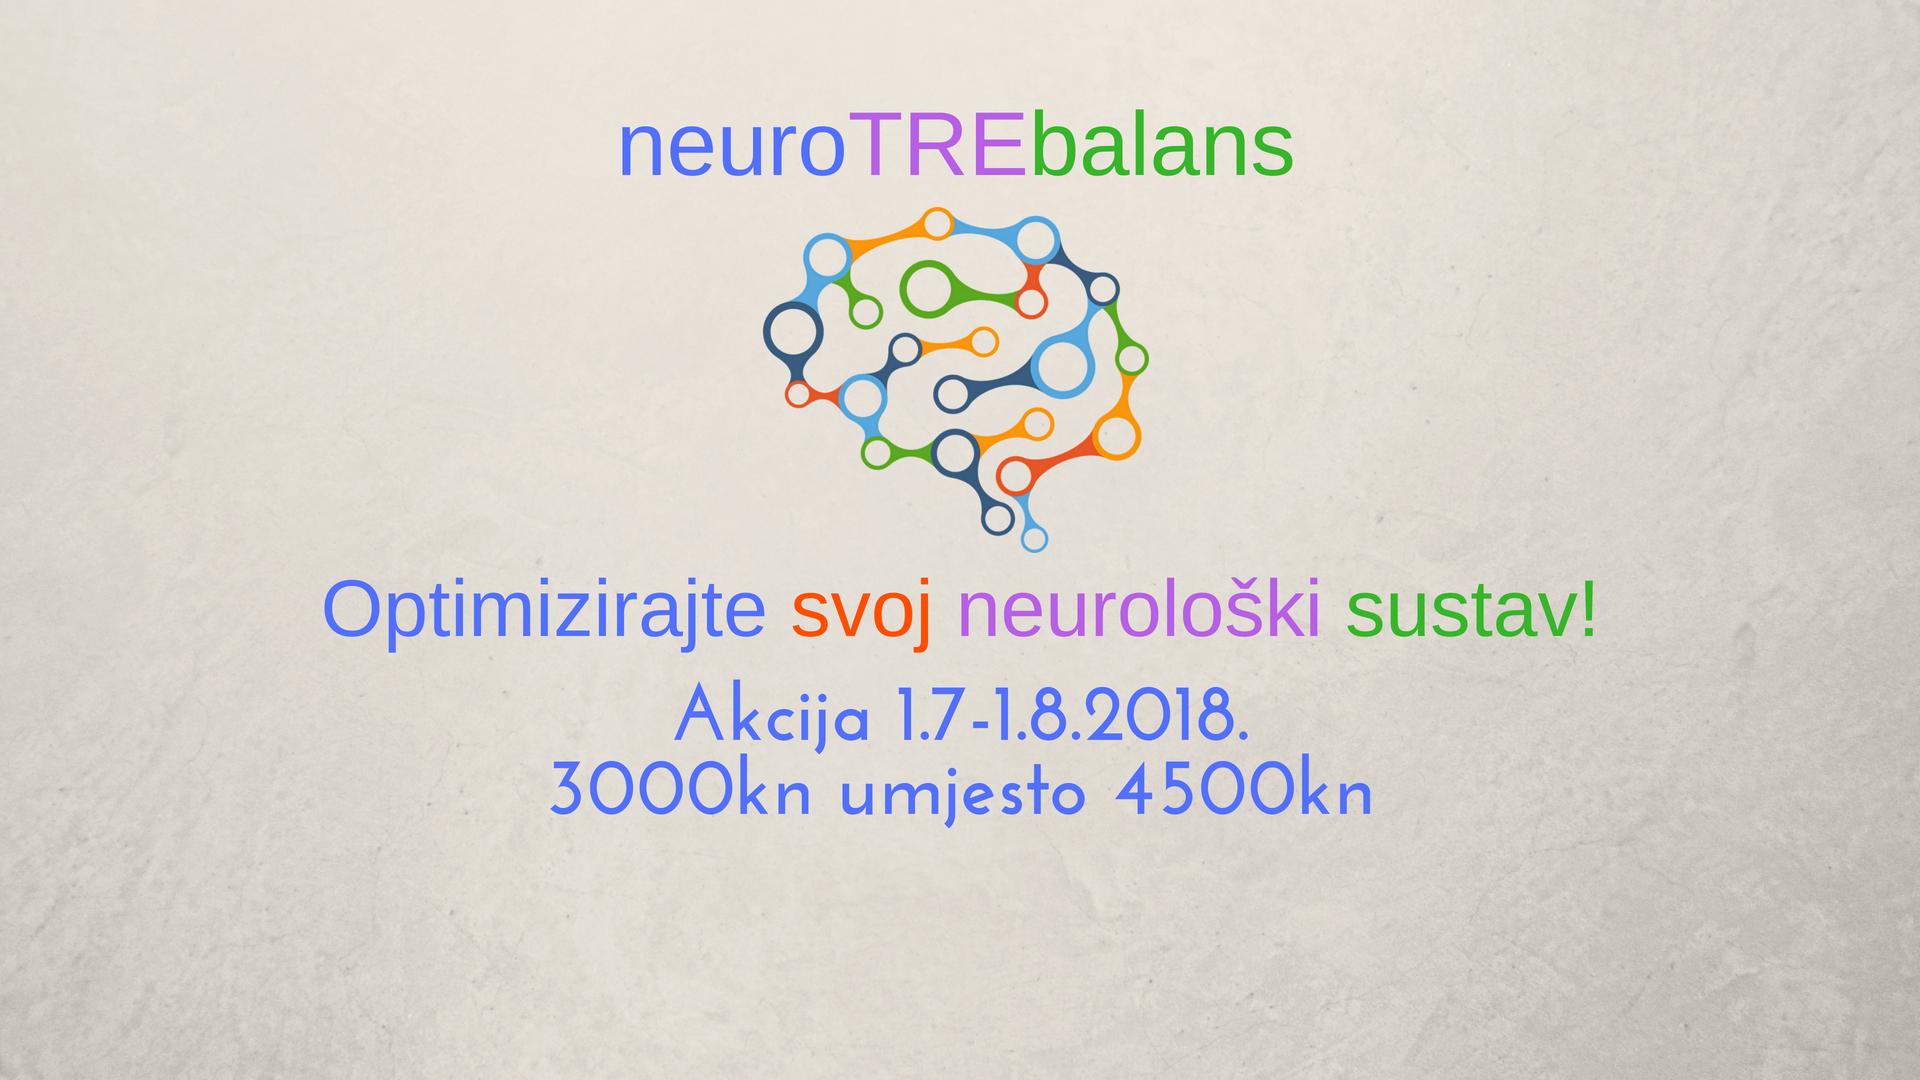 neuroTREbalans